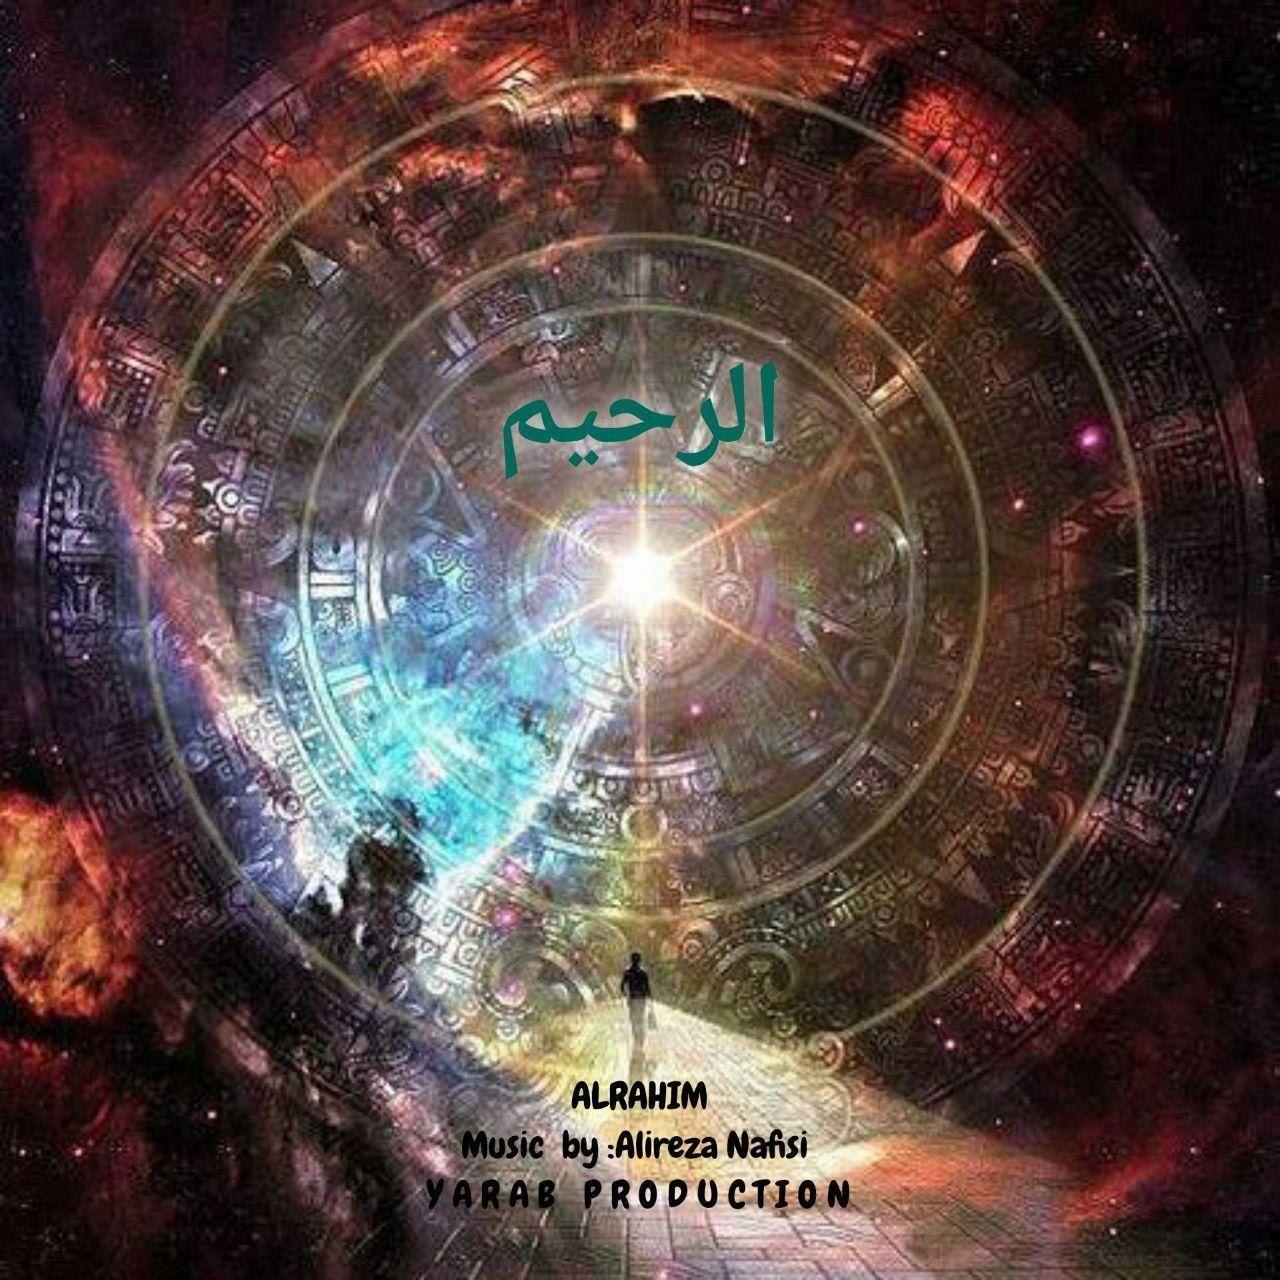 Alireza Nafisi – Alrahim (YaRab Production)